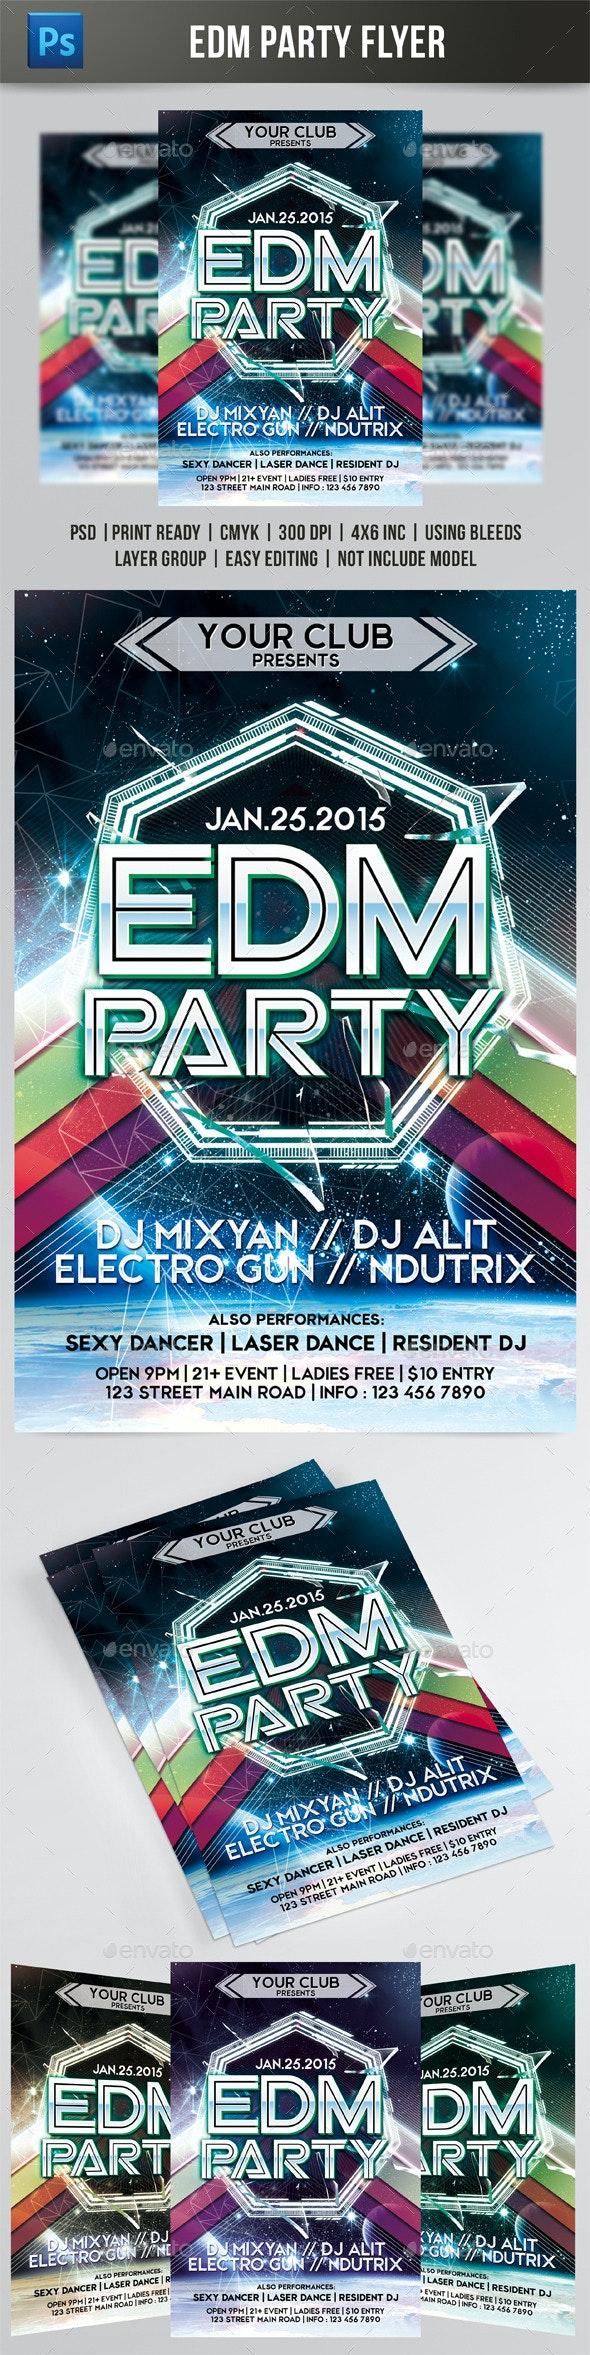 EDM Party Flyer - Events Flyers